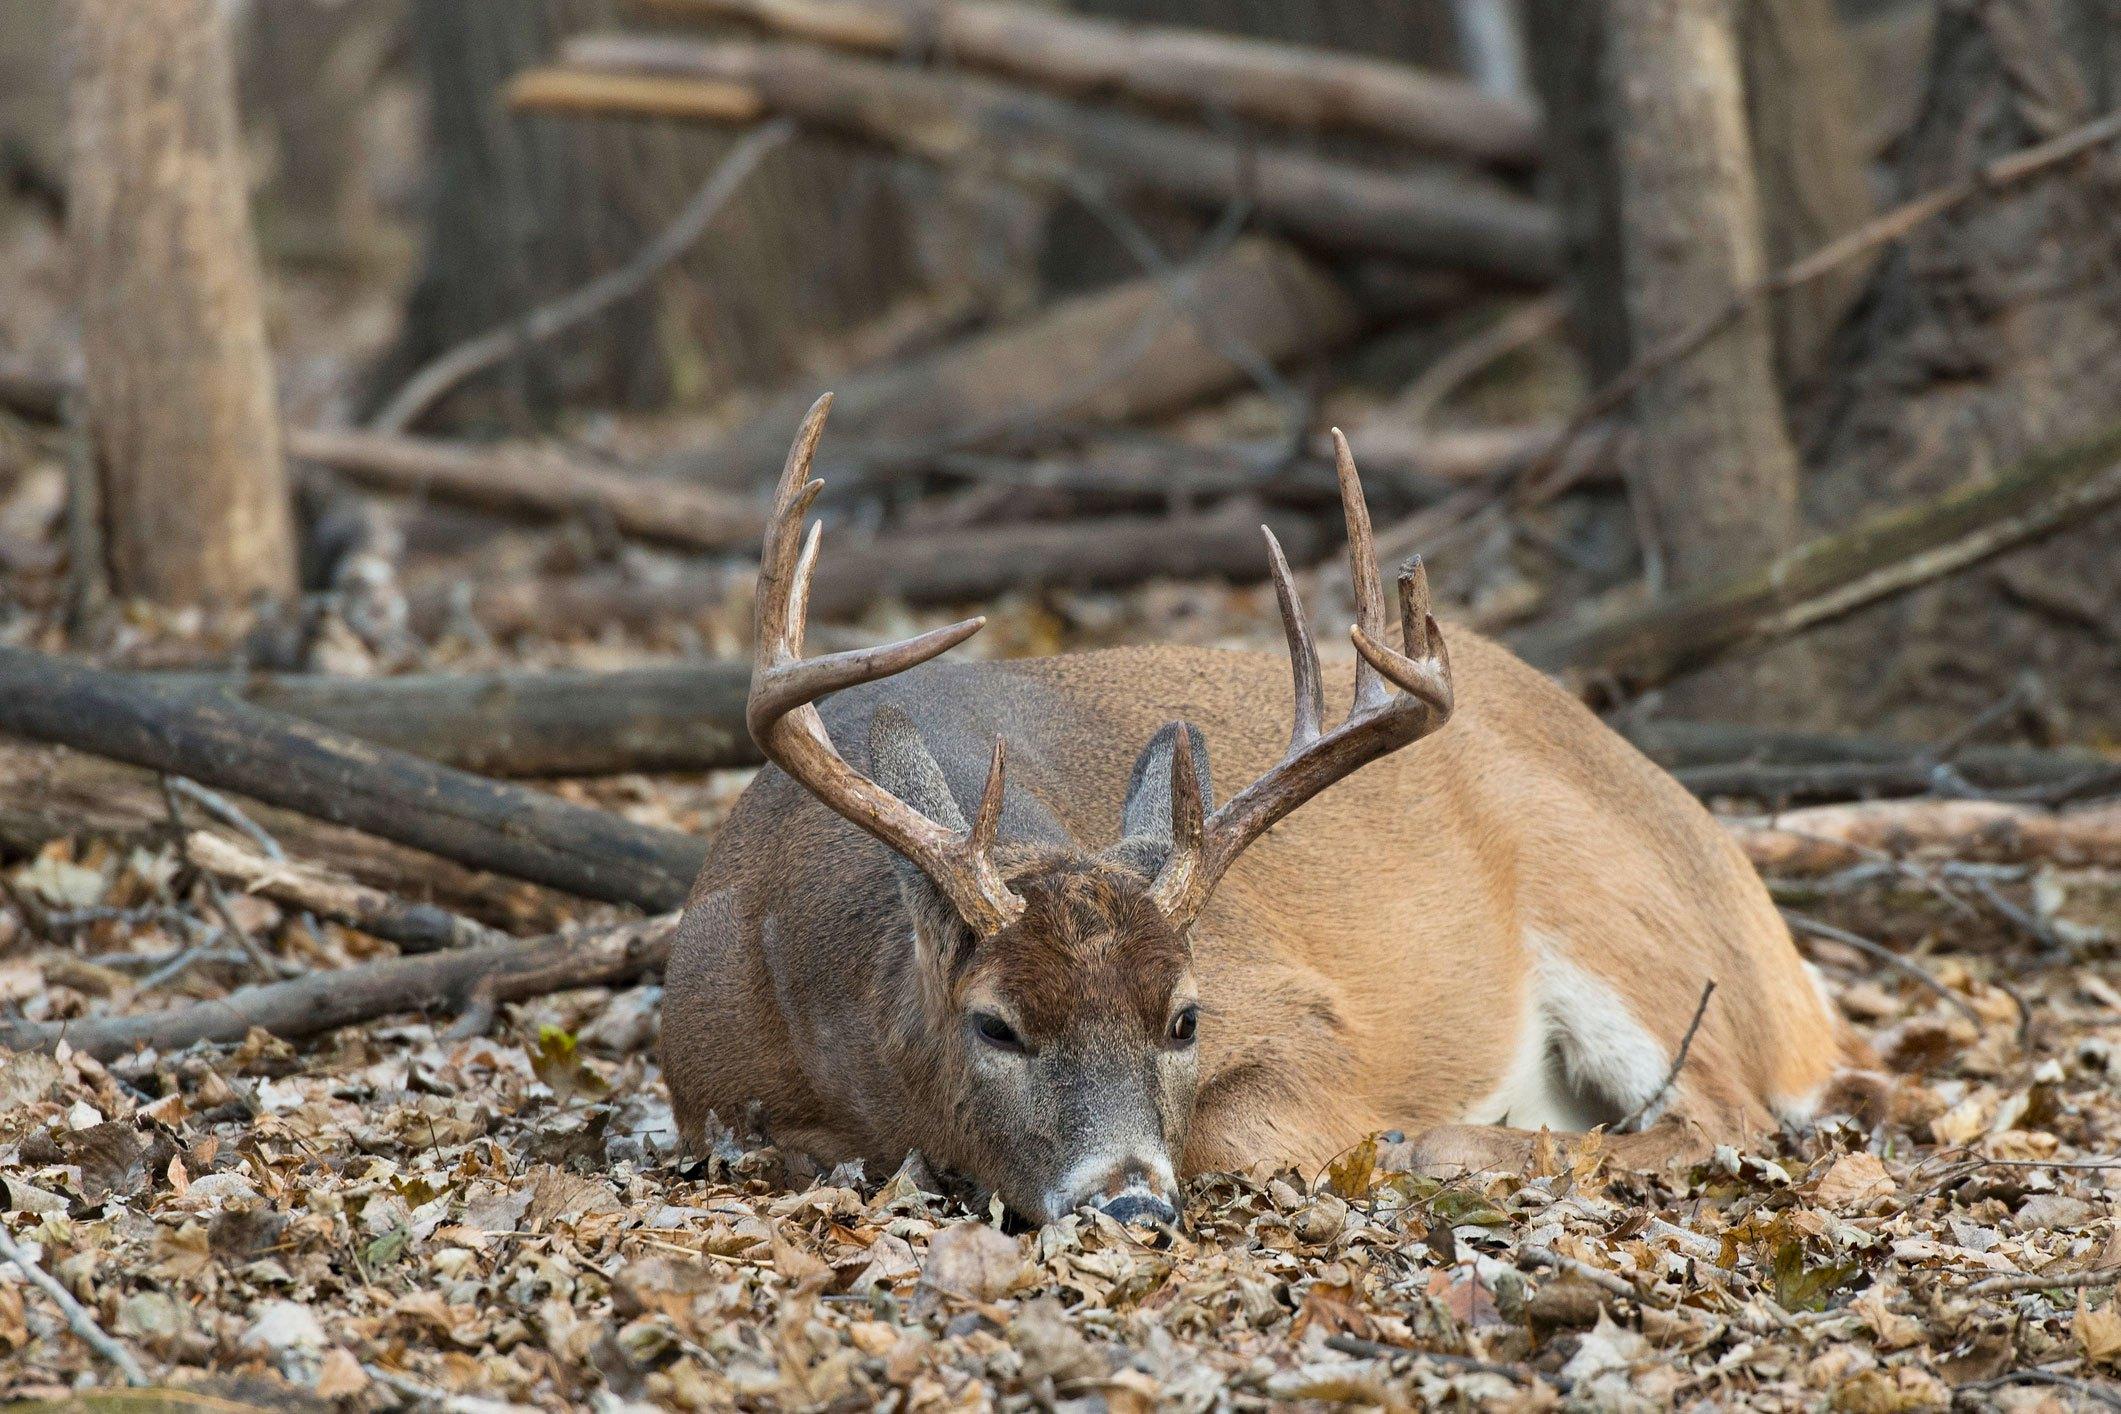 Where do deer sleep? - Grand View Outdoors